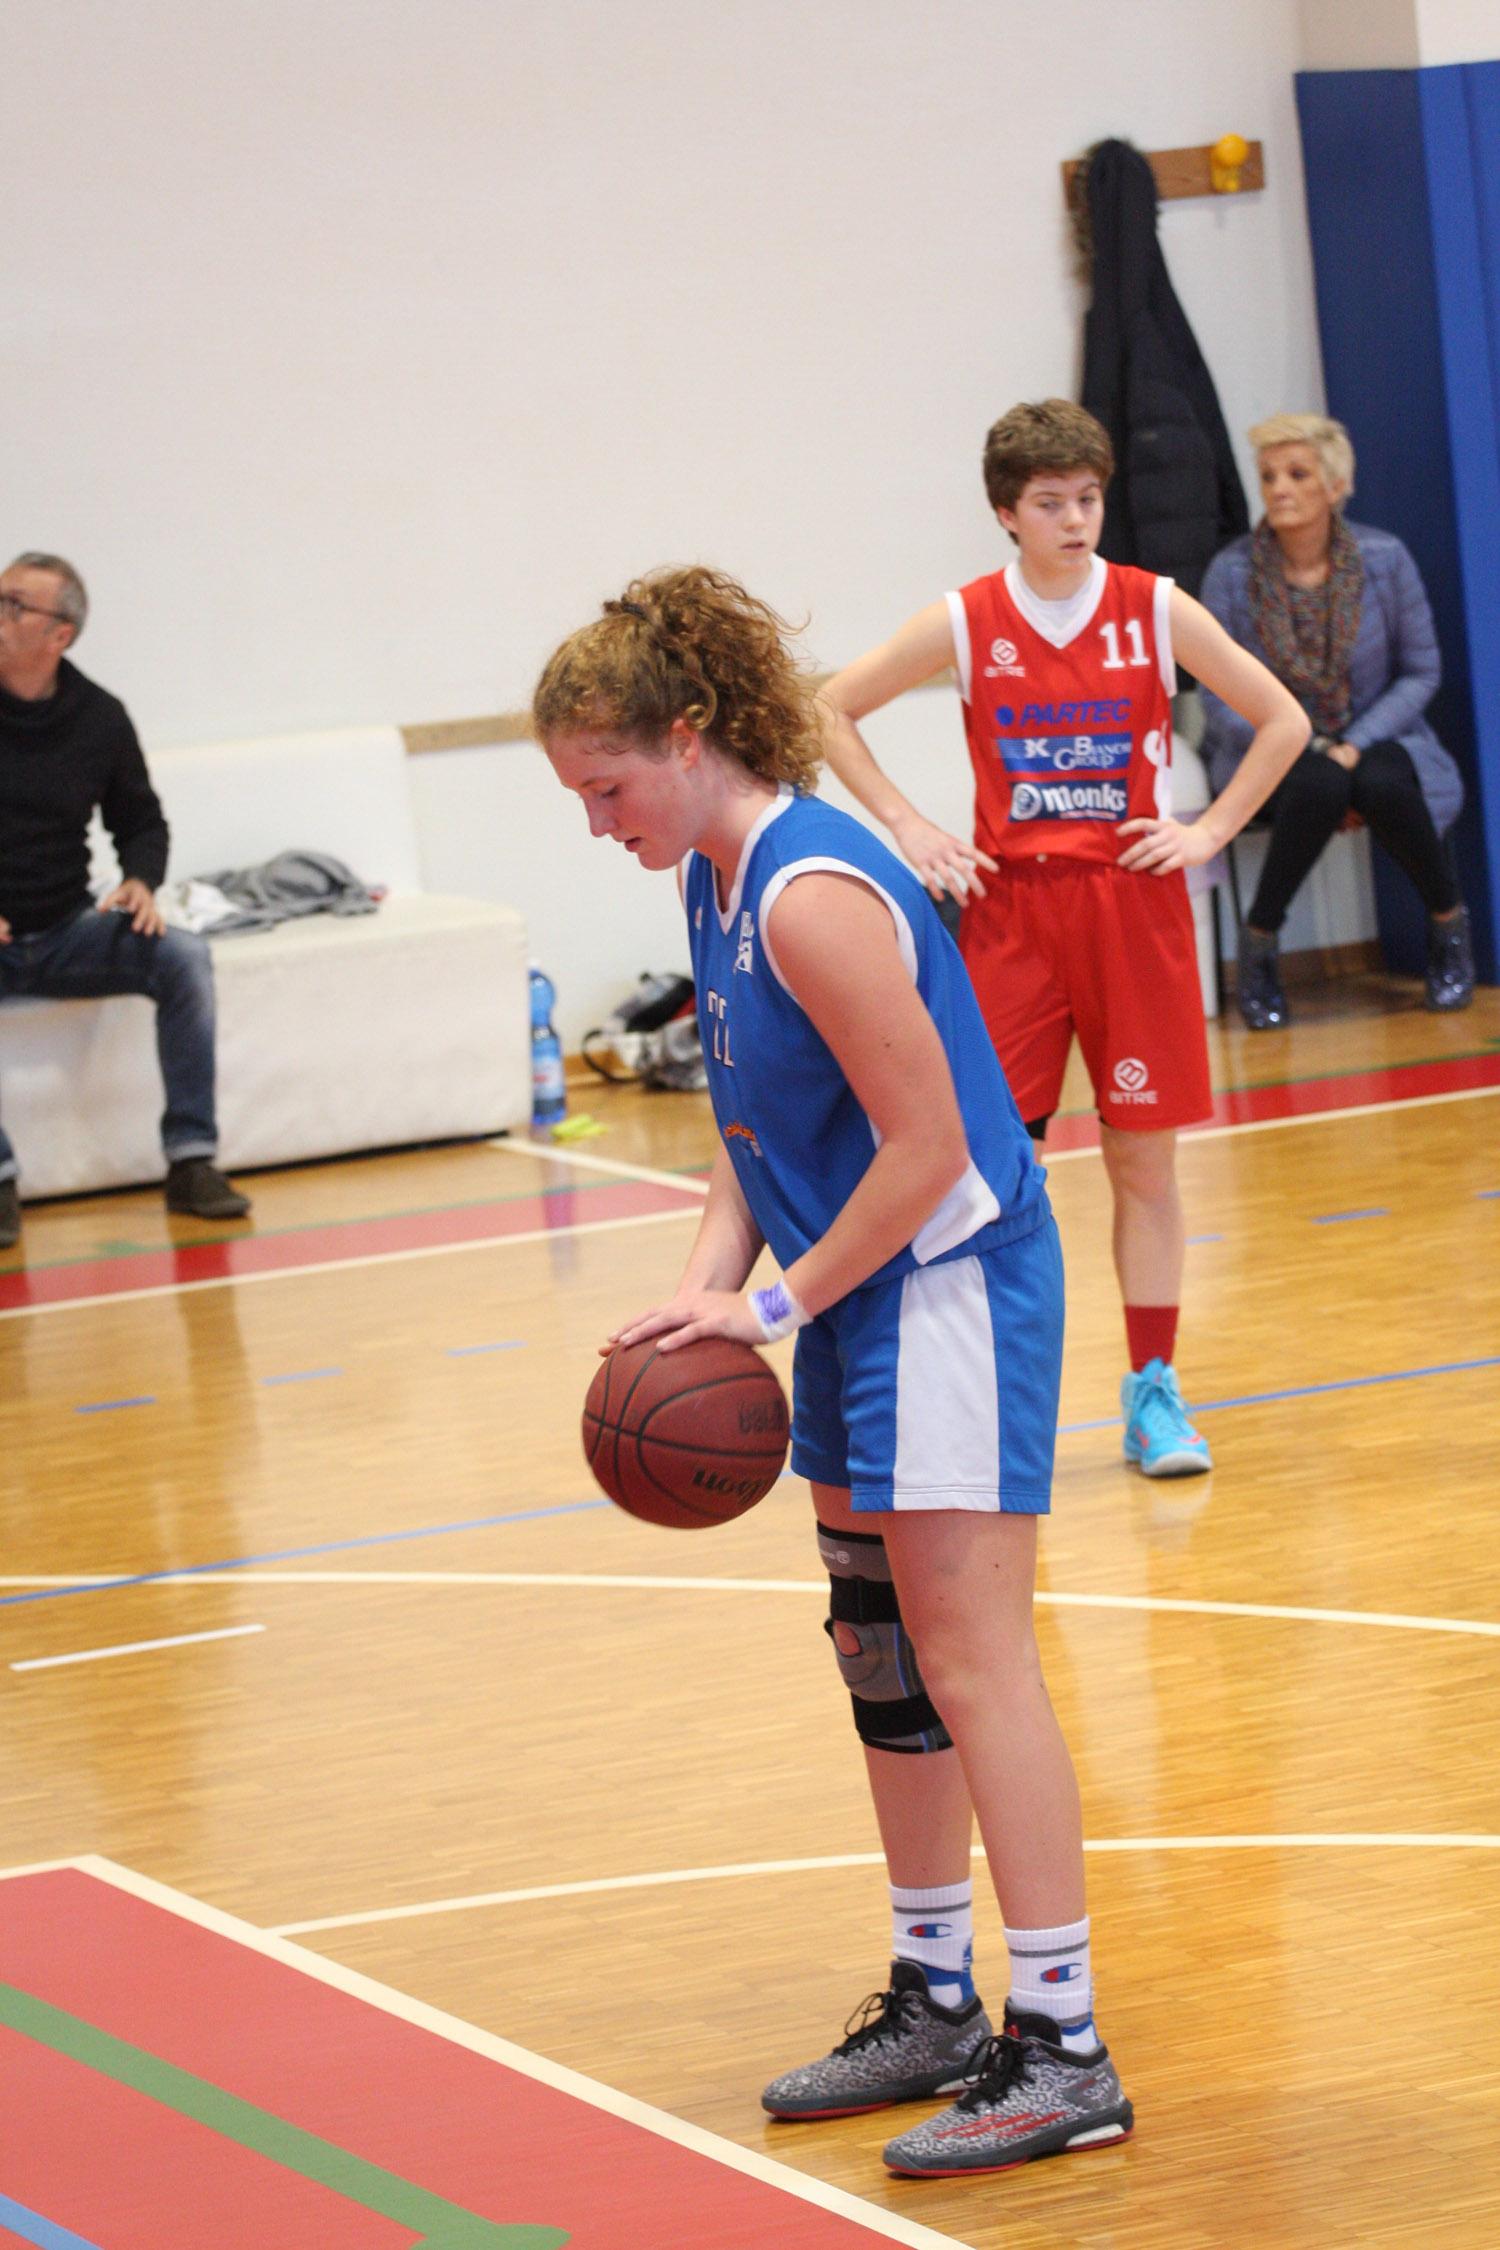 U16E - Costa Masnaga vs Baskettiamo Vittuone 2001 00014.jpg